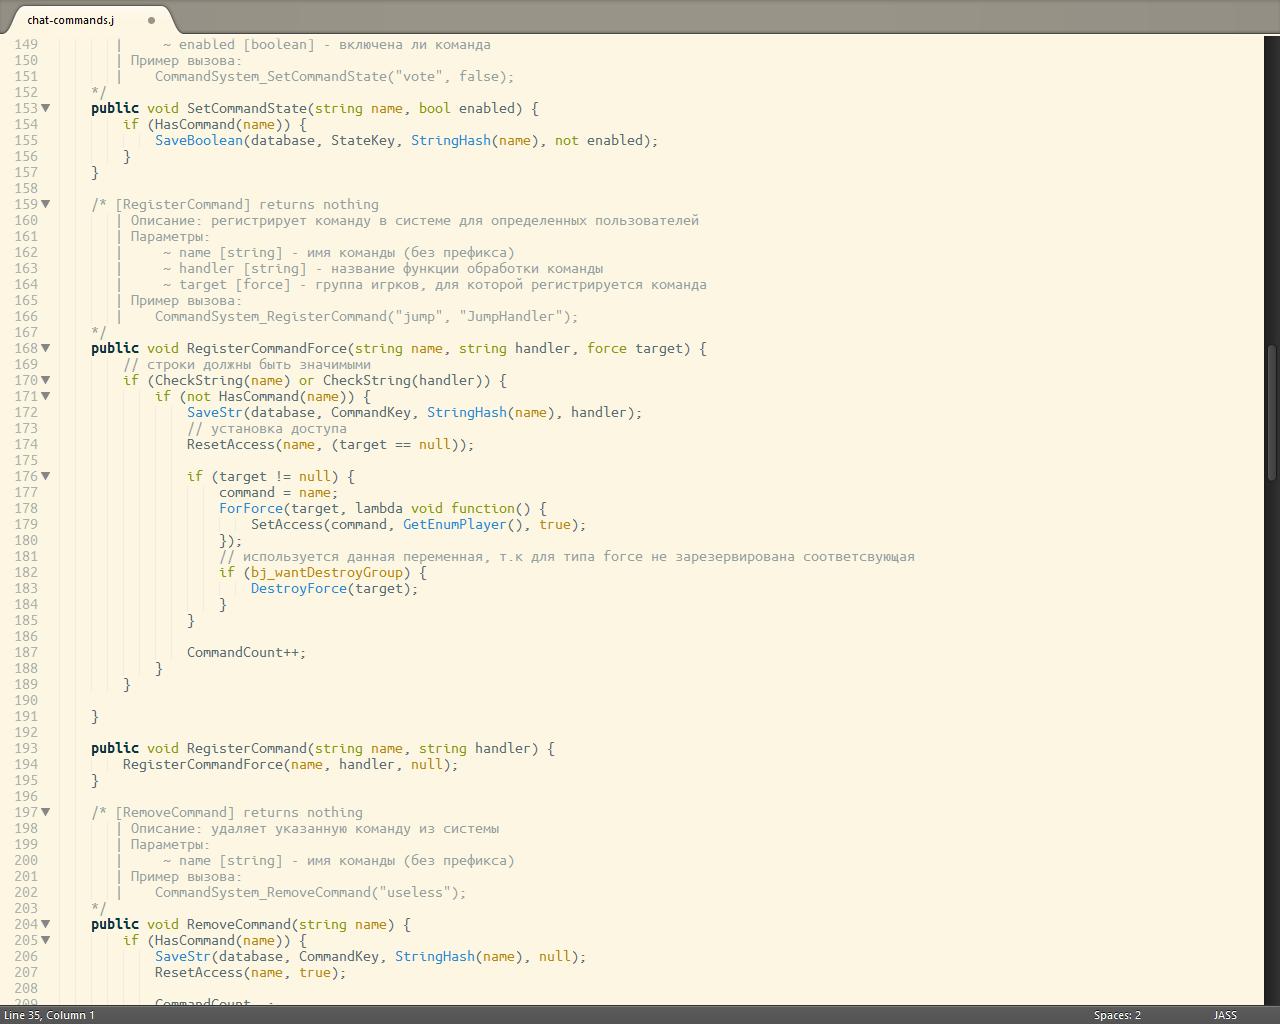 http://xgm.guru/p/wc3/jass-syntax-sublime-textmate